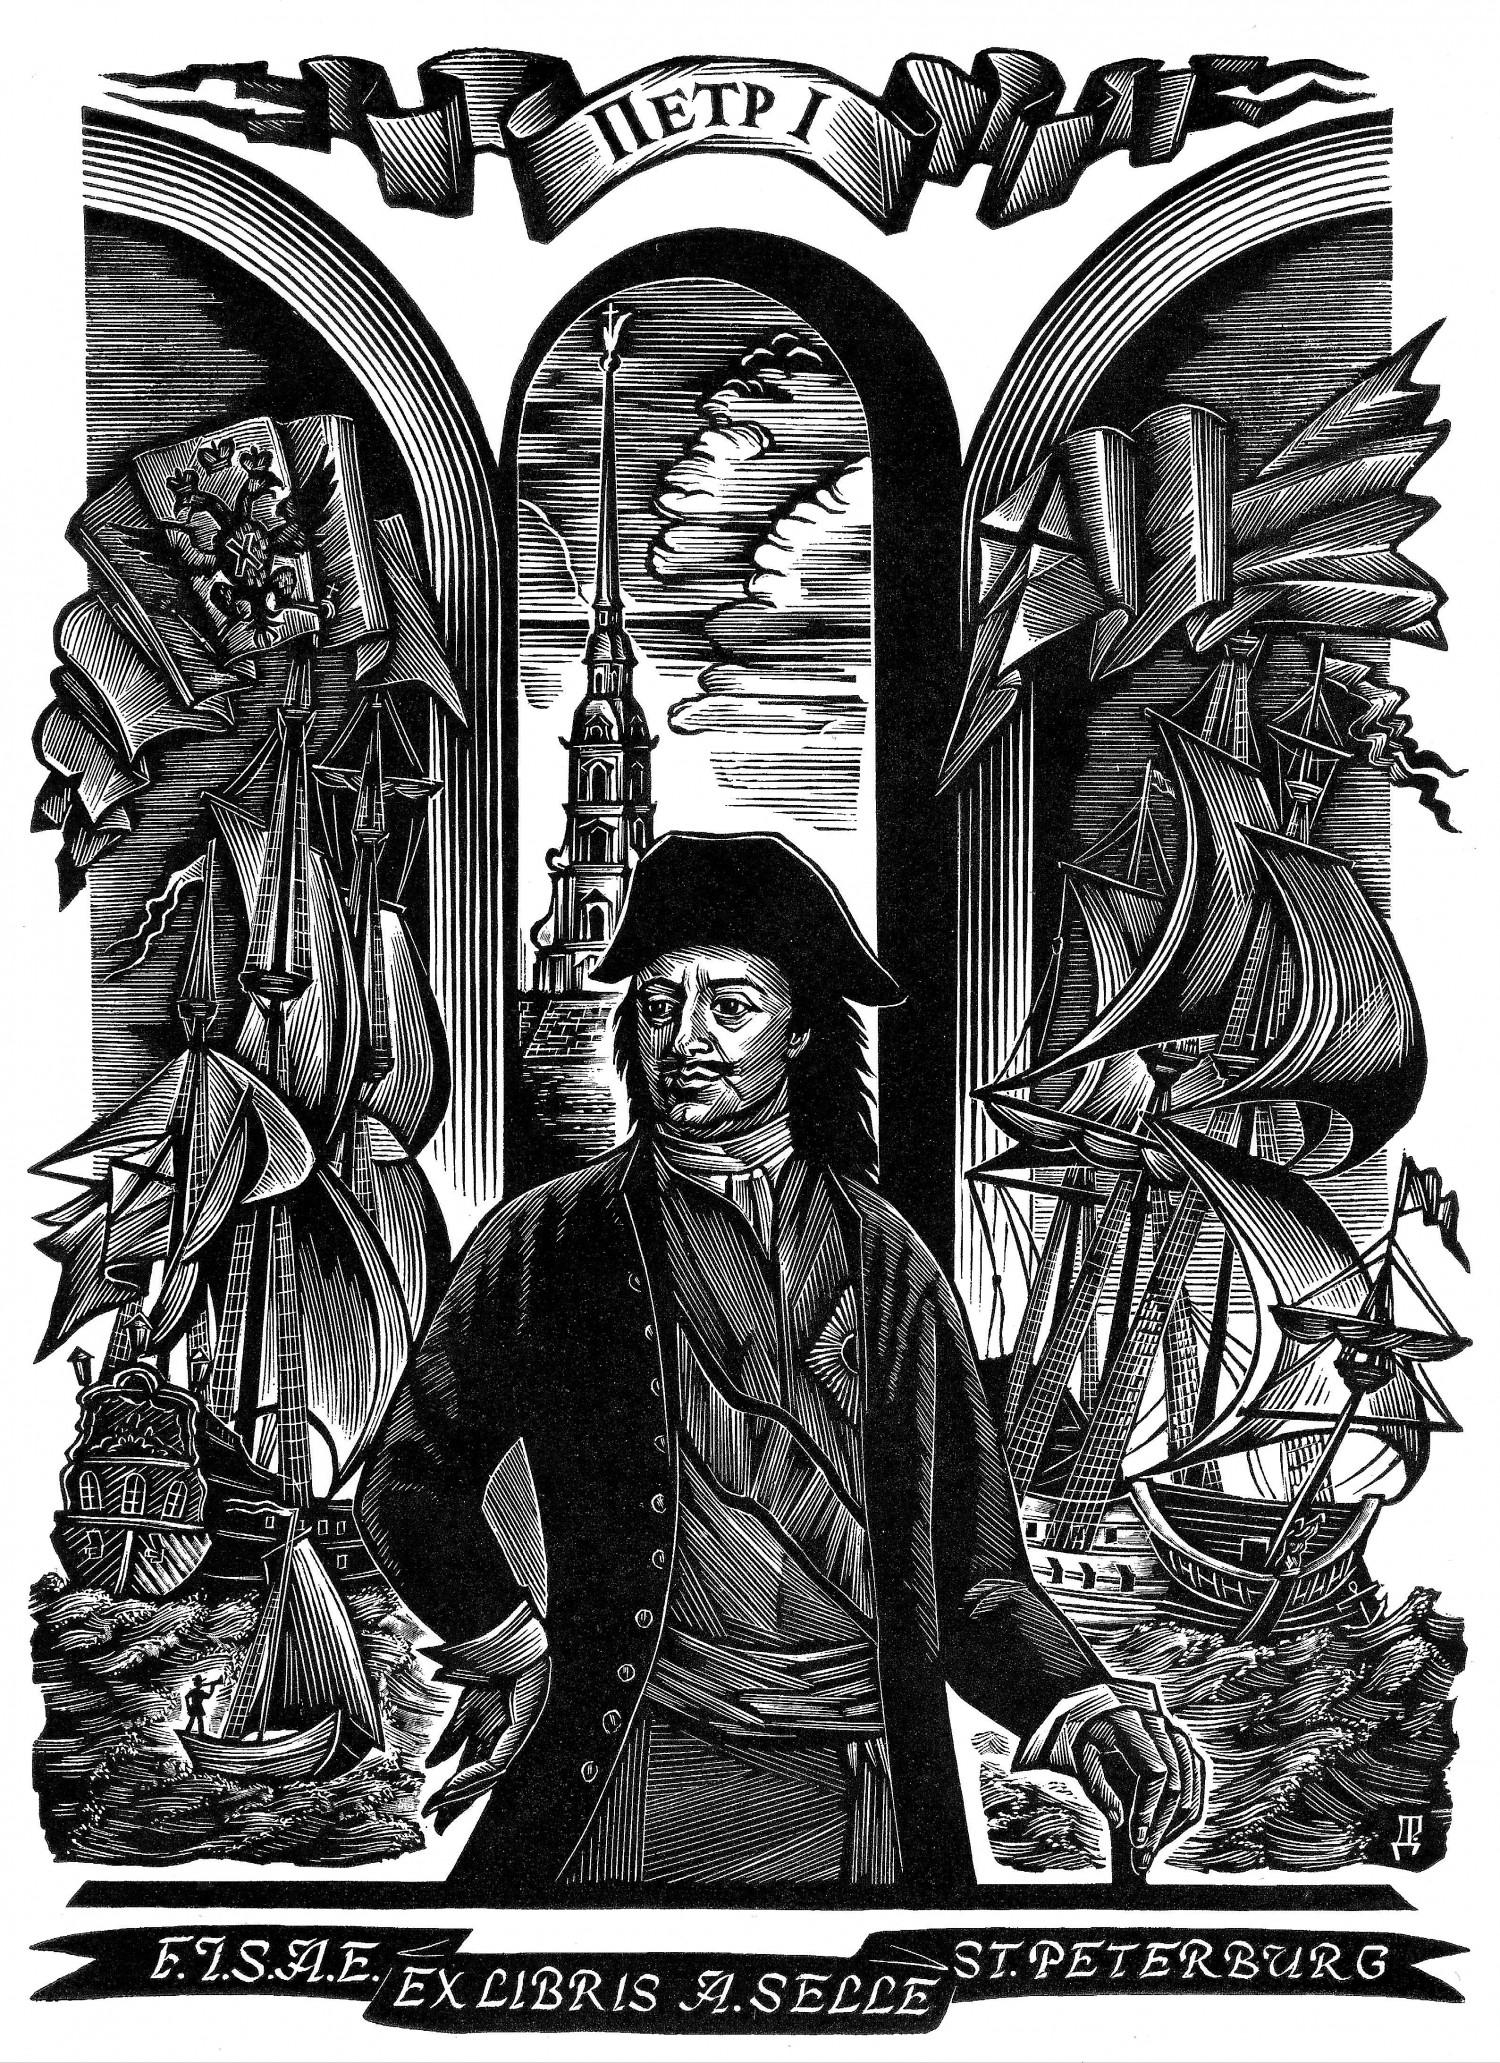 Д.П.Реутов. Пётр I. Экслибрис Андреаса Зелле. 1998 г.. Ксилография. 17,8х13